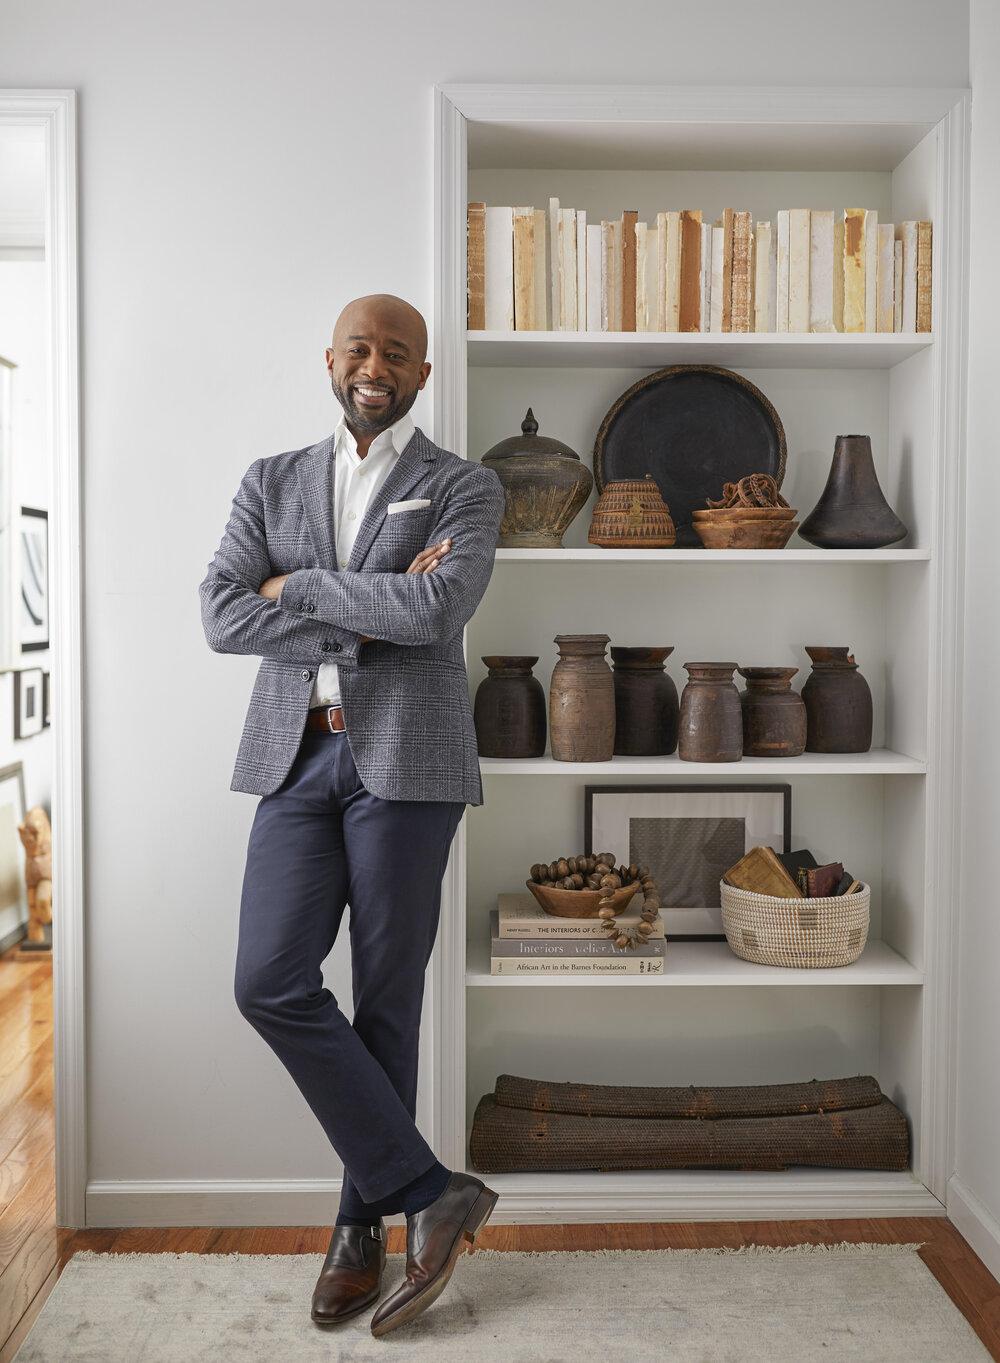 Image from Mikel's portfolio.